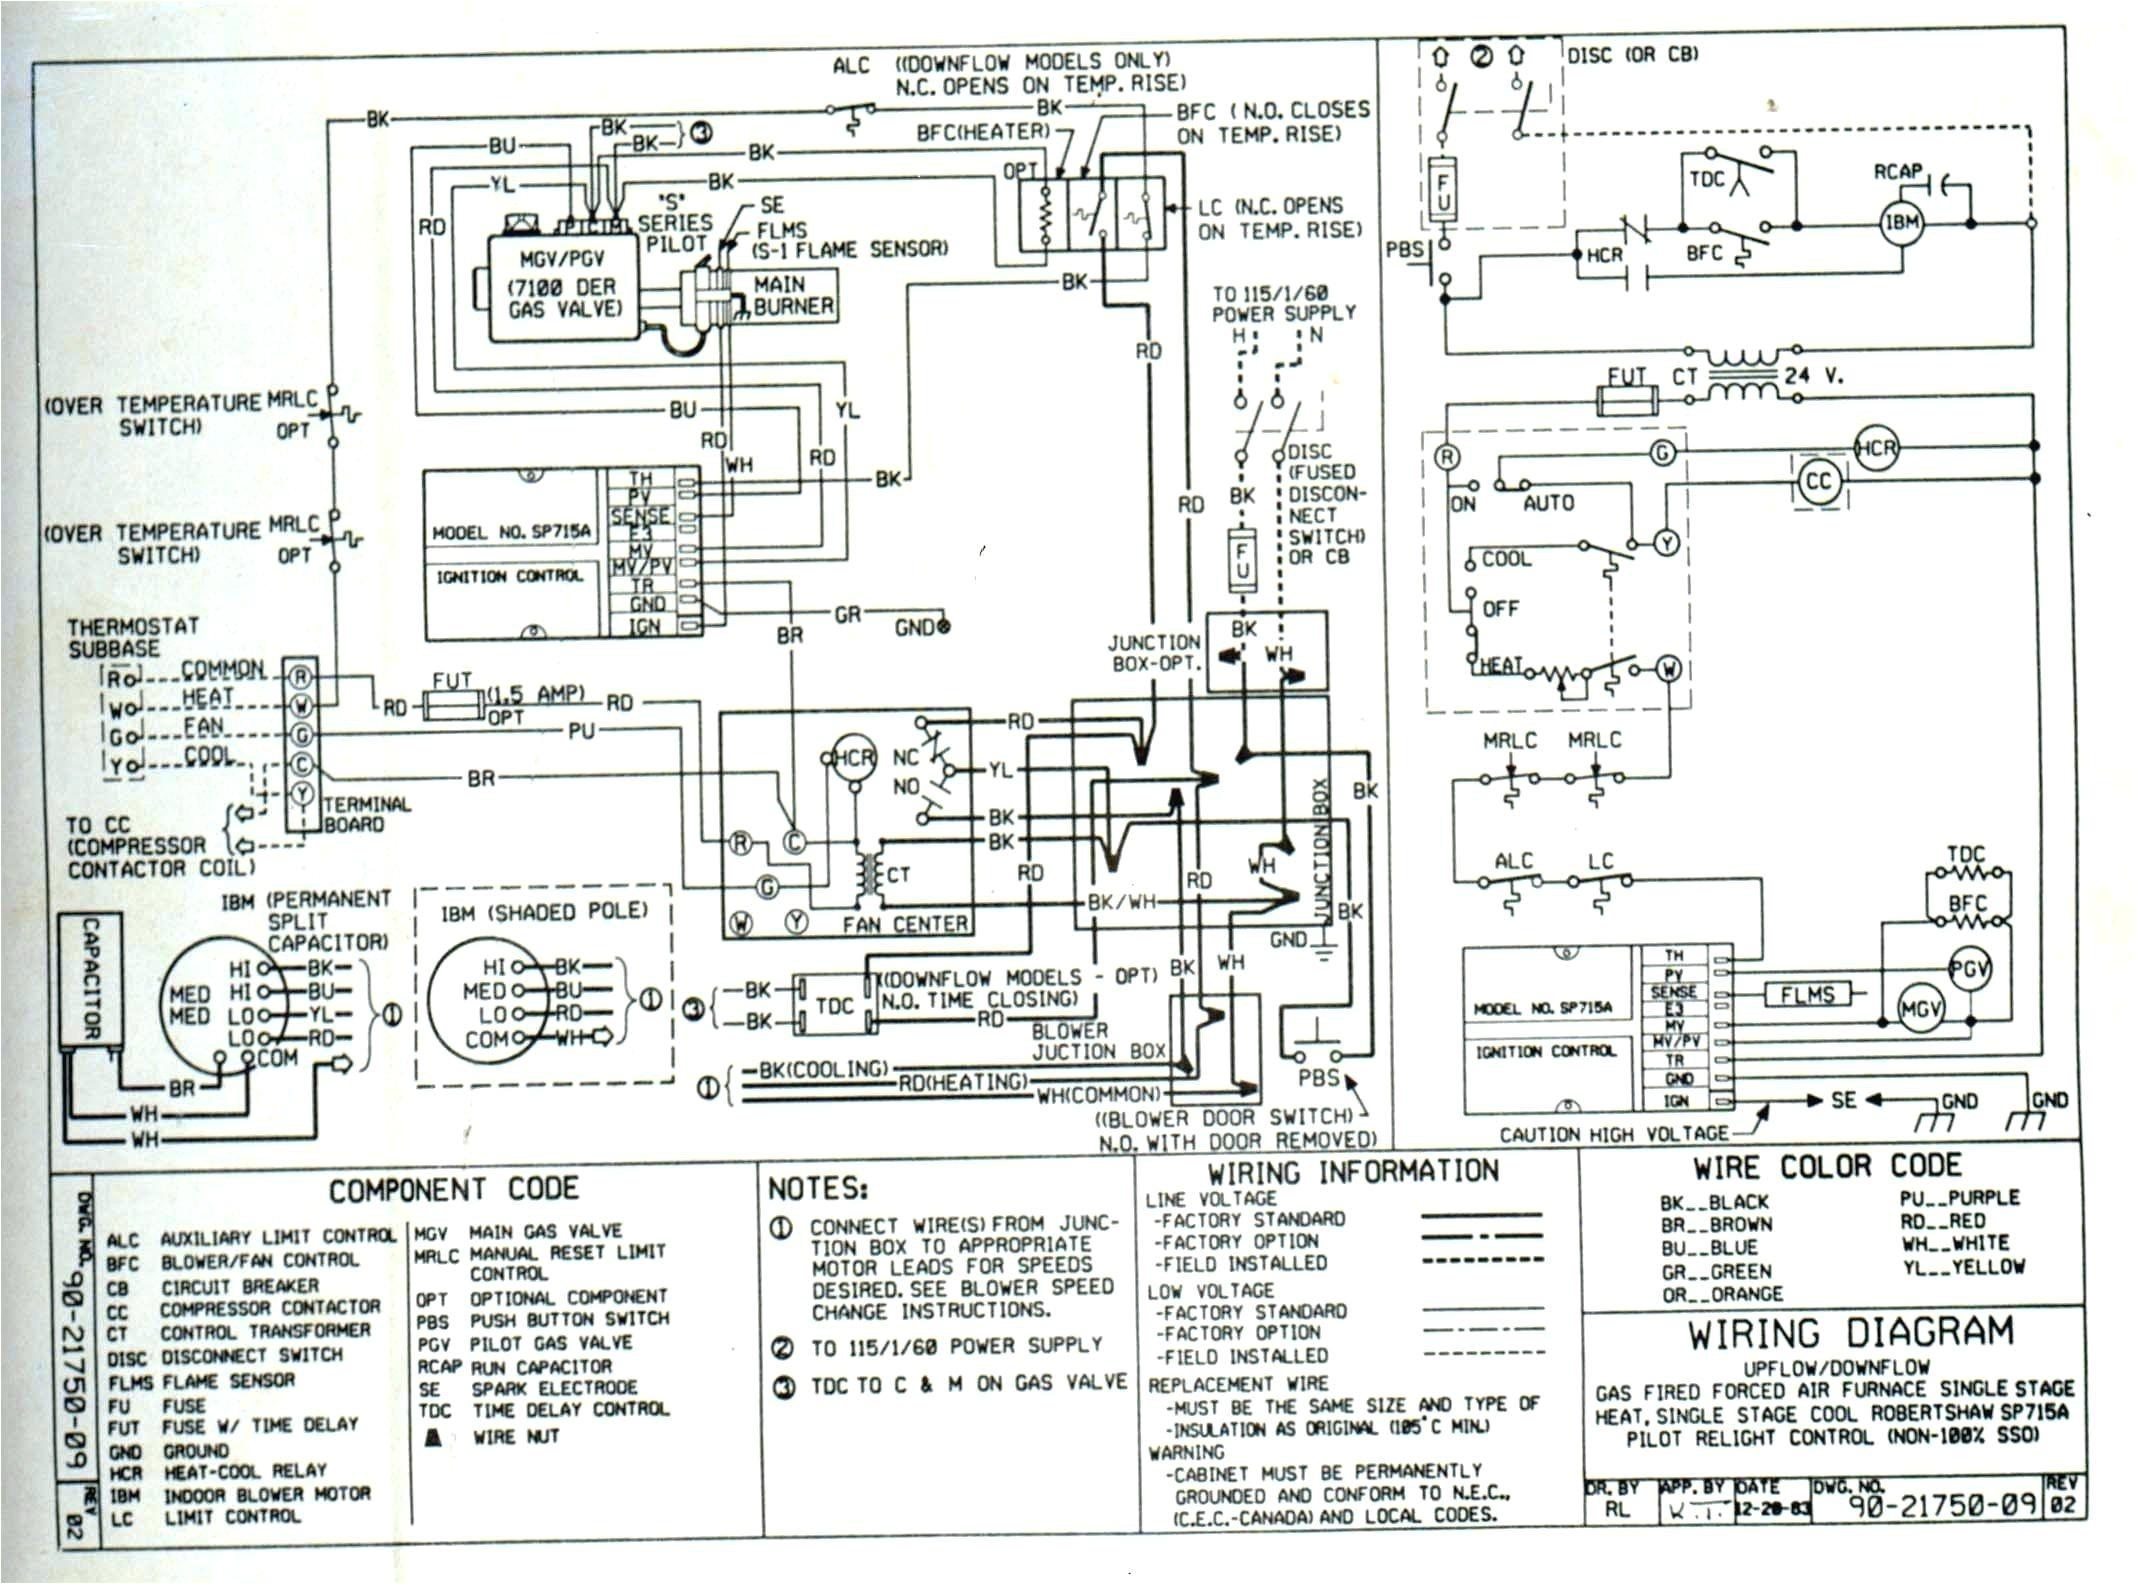 trane ac system wiring diagram electrical diagrams best of air handler jpg